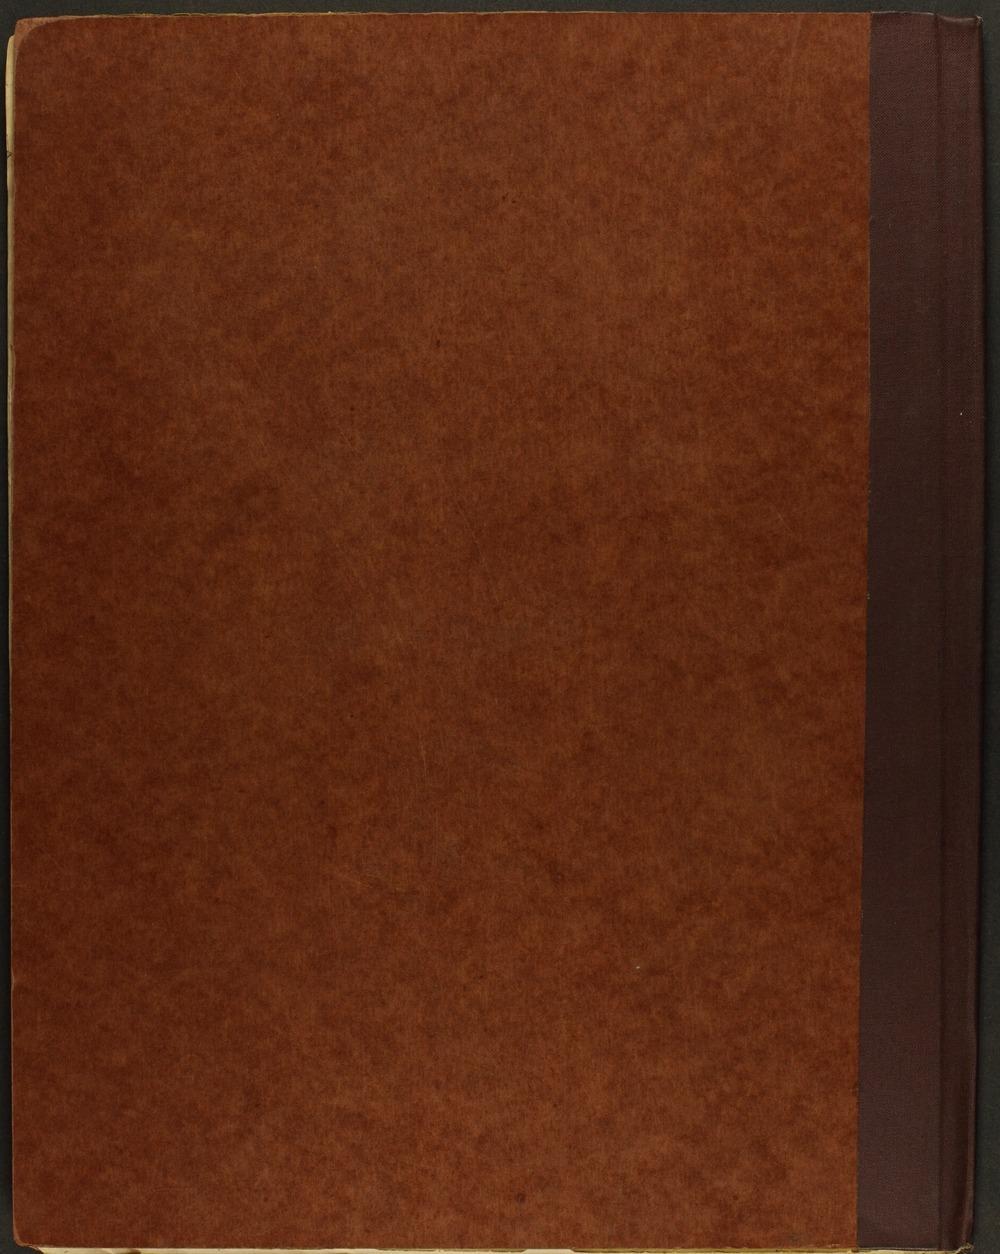 Handbook of Greenwood County, Kansas - Back Cover